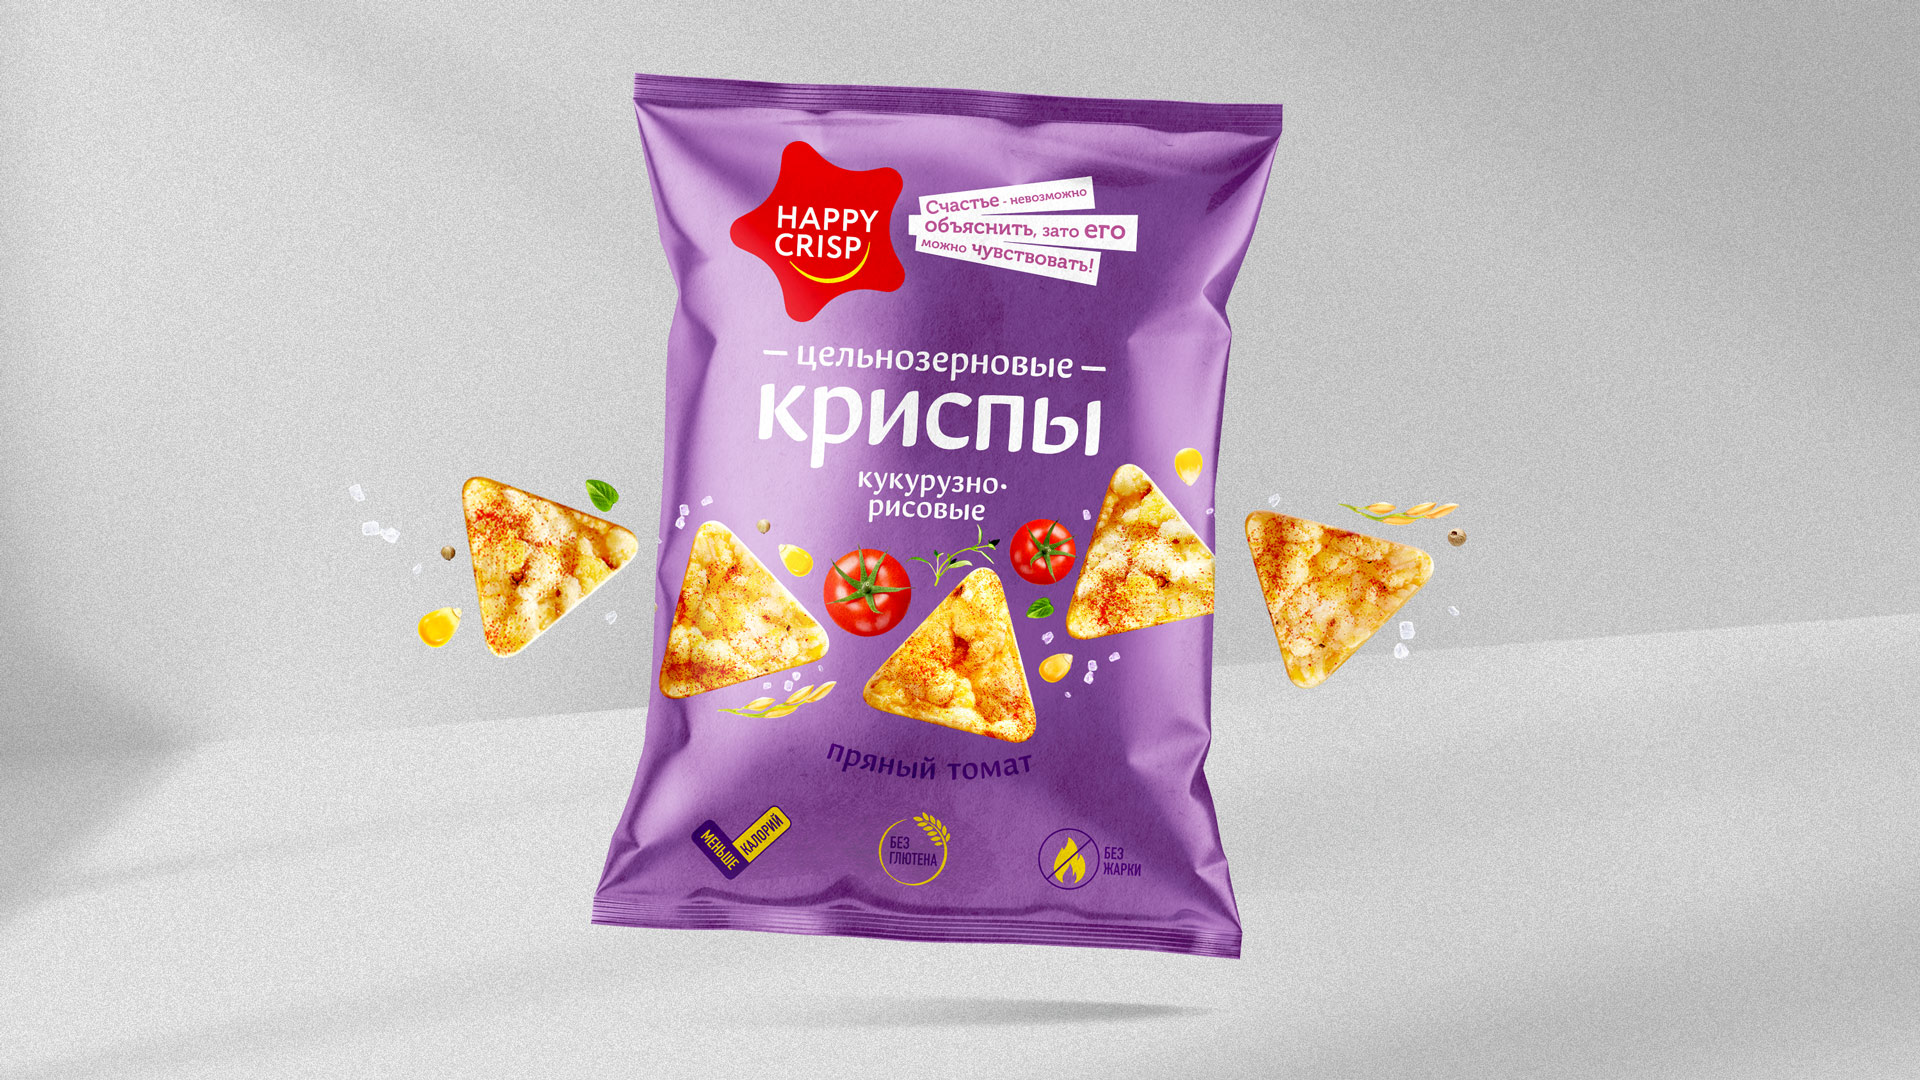 Happy Crisp